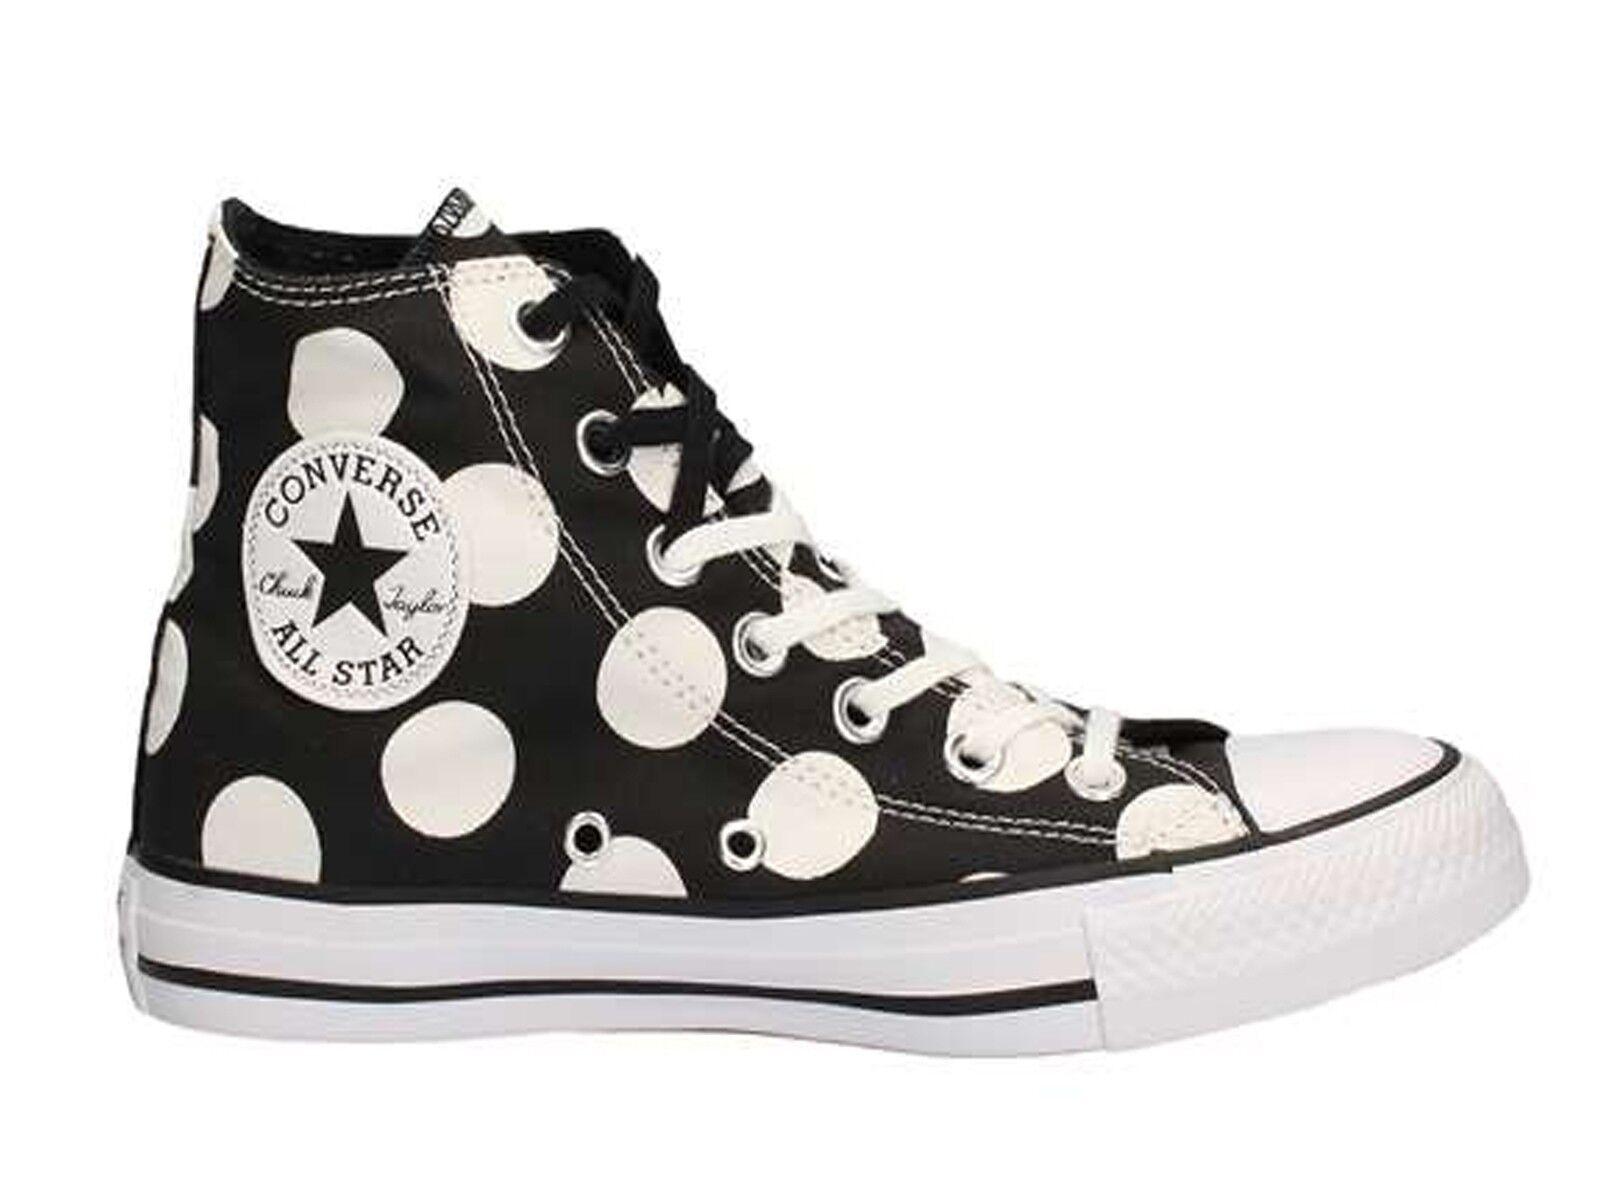 chaussures femmes CONVERSE  556814C  ALL STAR HI CANVAS PRINT noir blanc DOTS